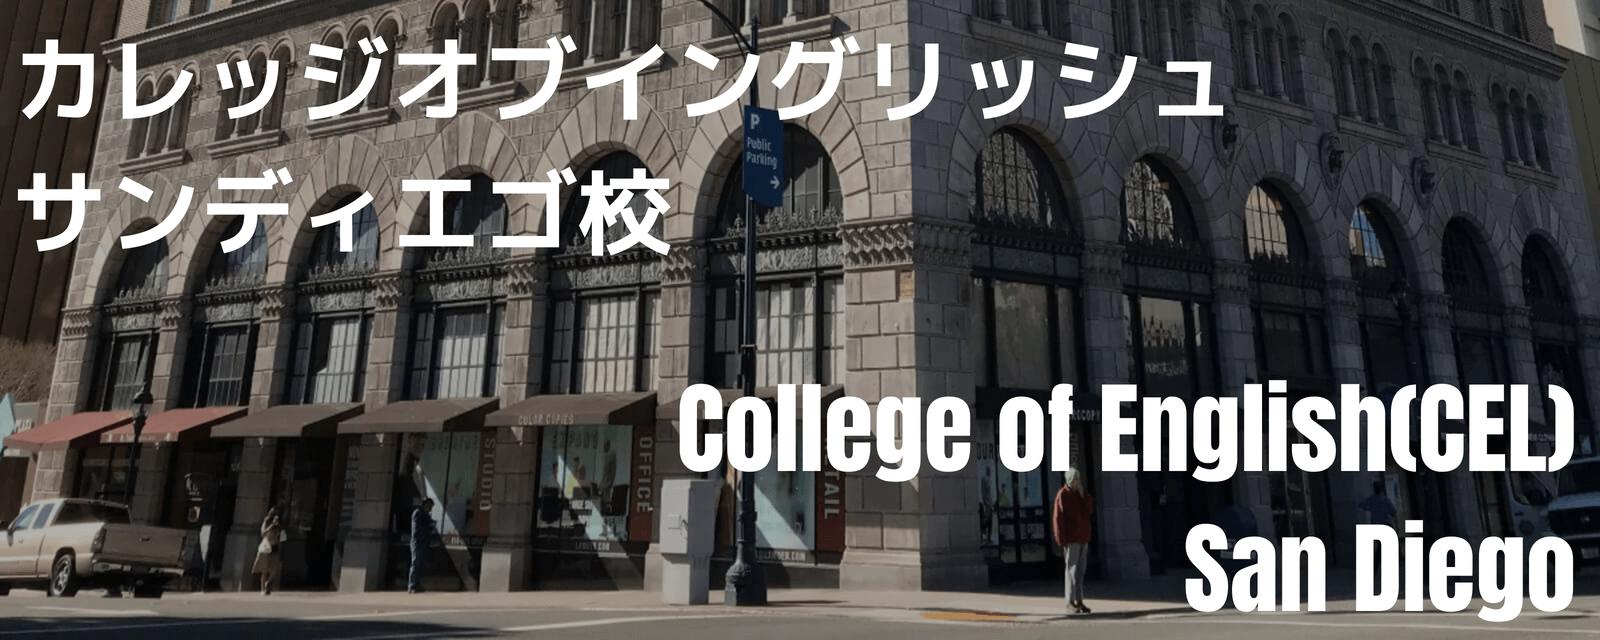 College of English San Diego